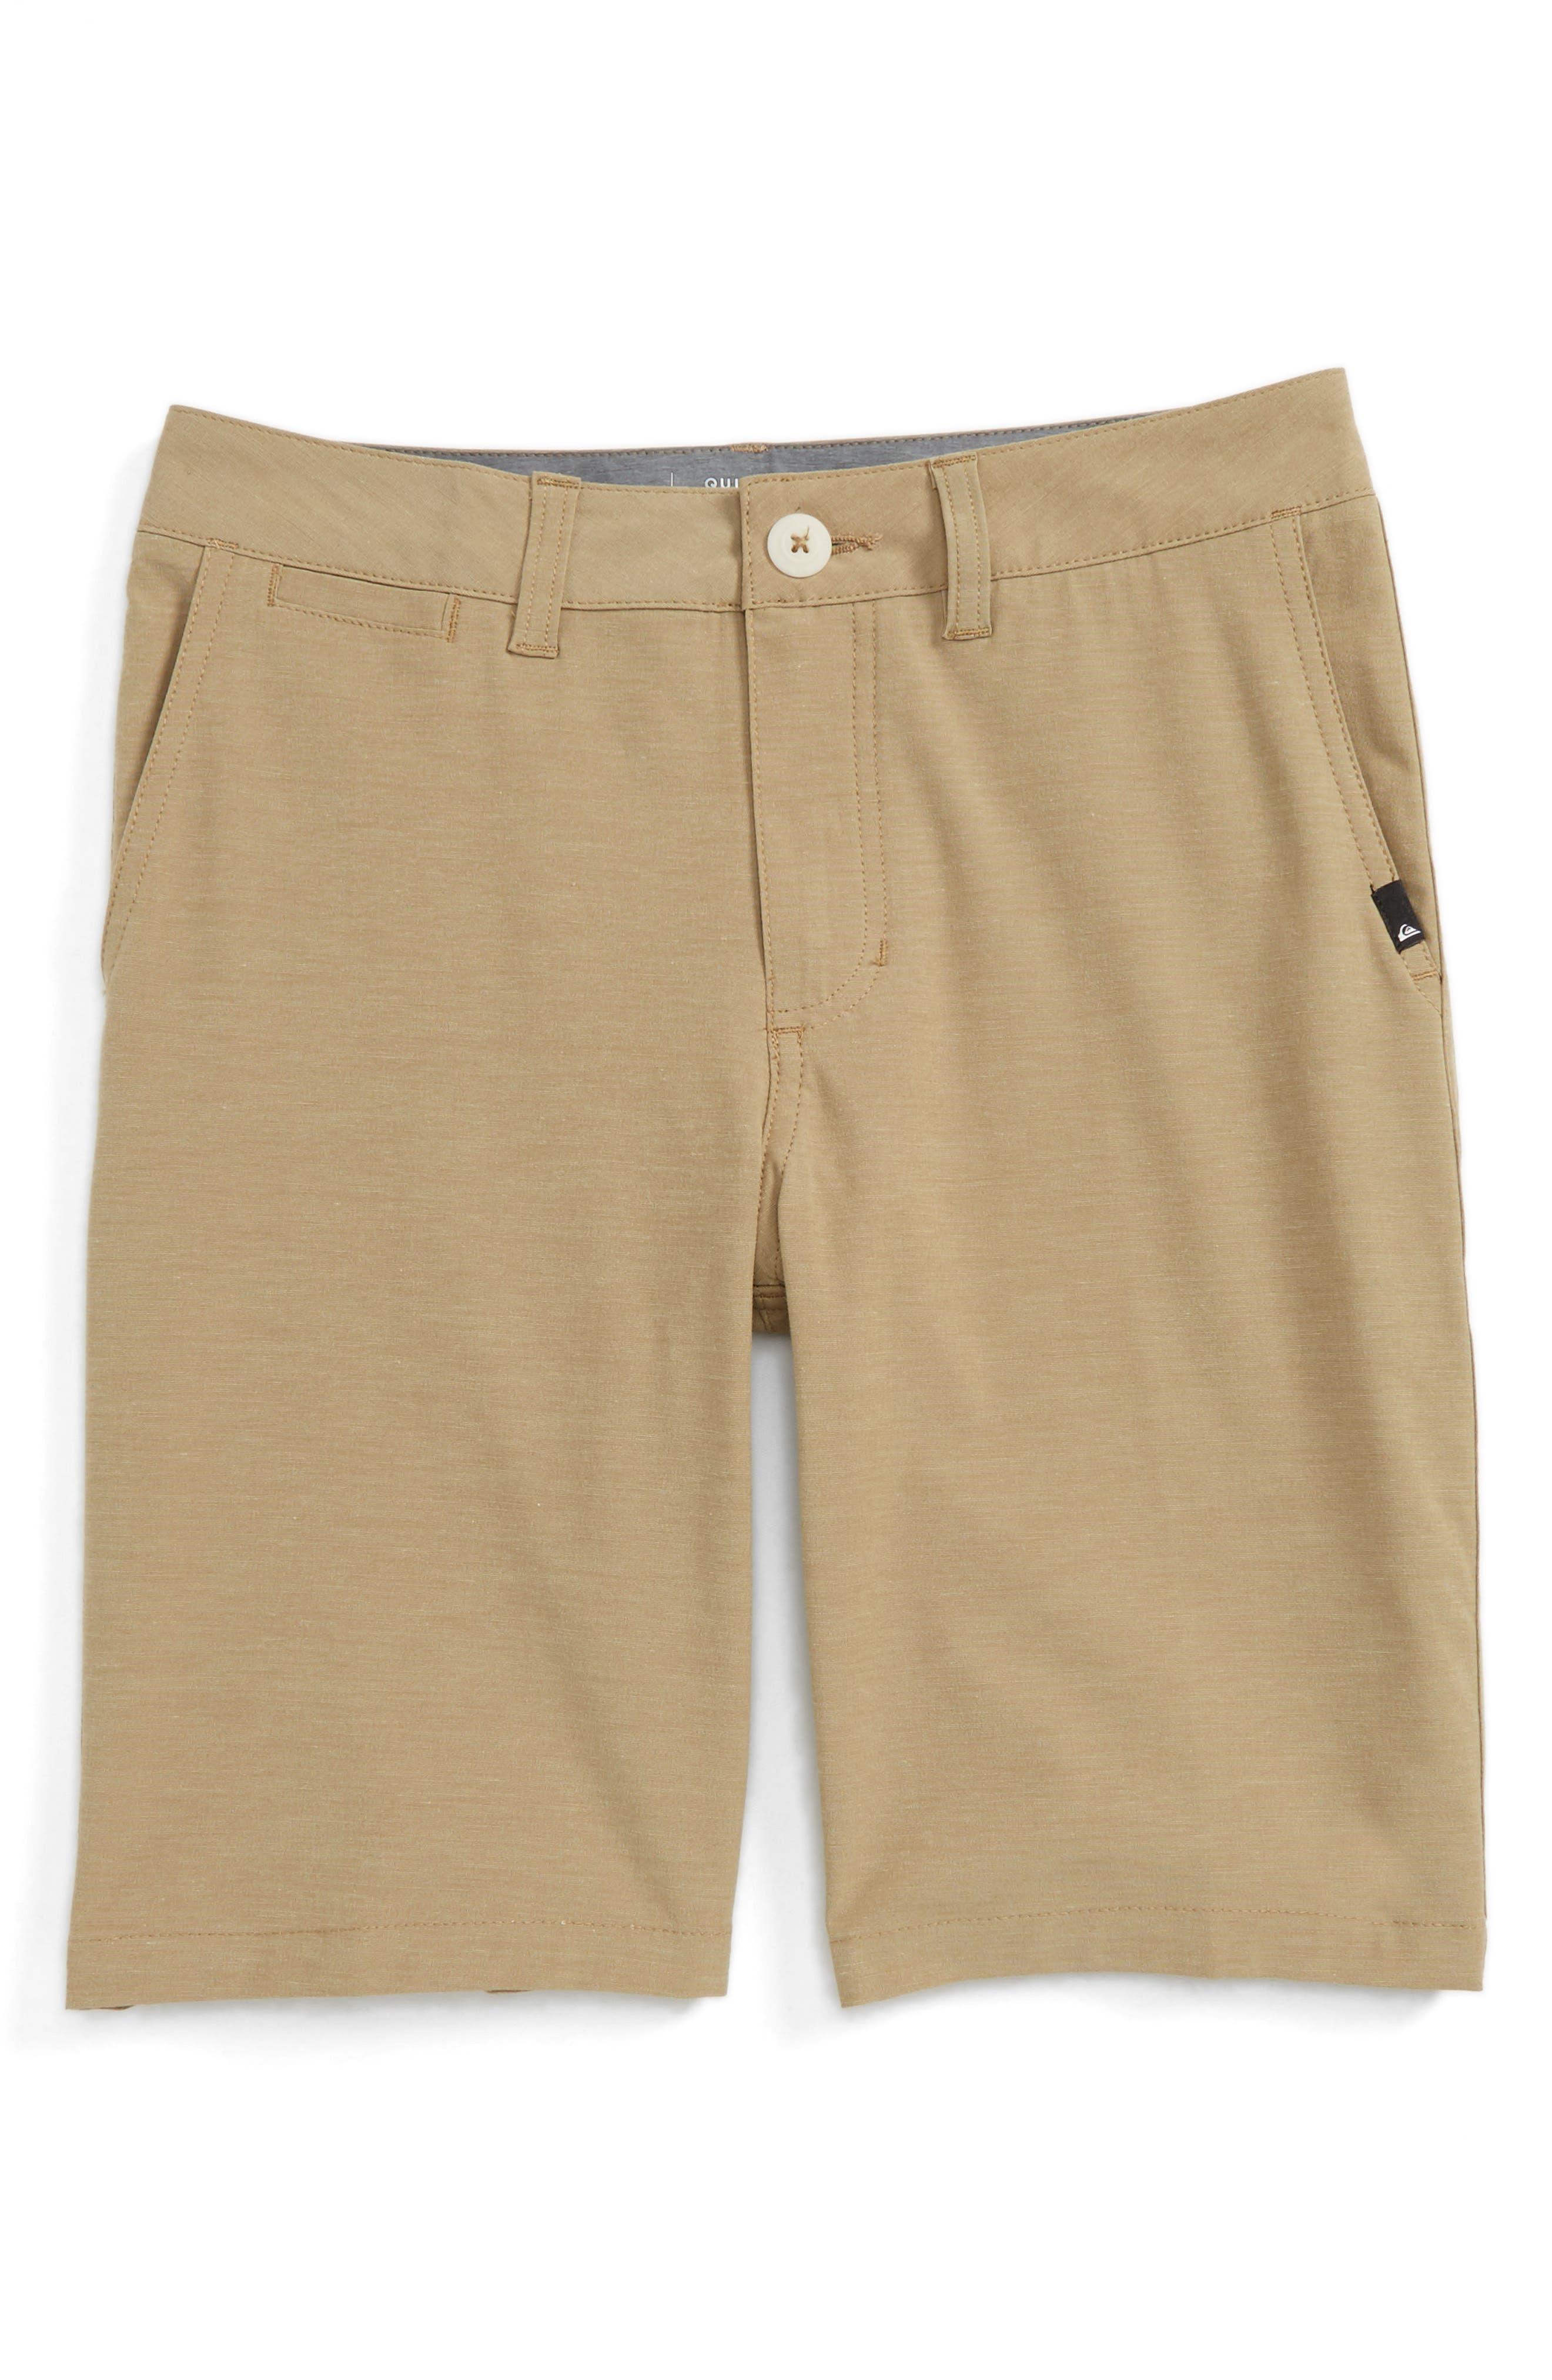 Alternate Image 1 Selected - Quiksilver Amphibian Hybrid Shorts (Big Boys)